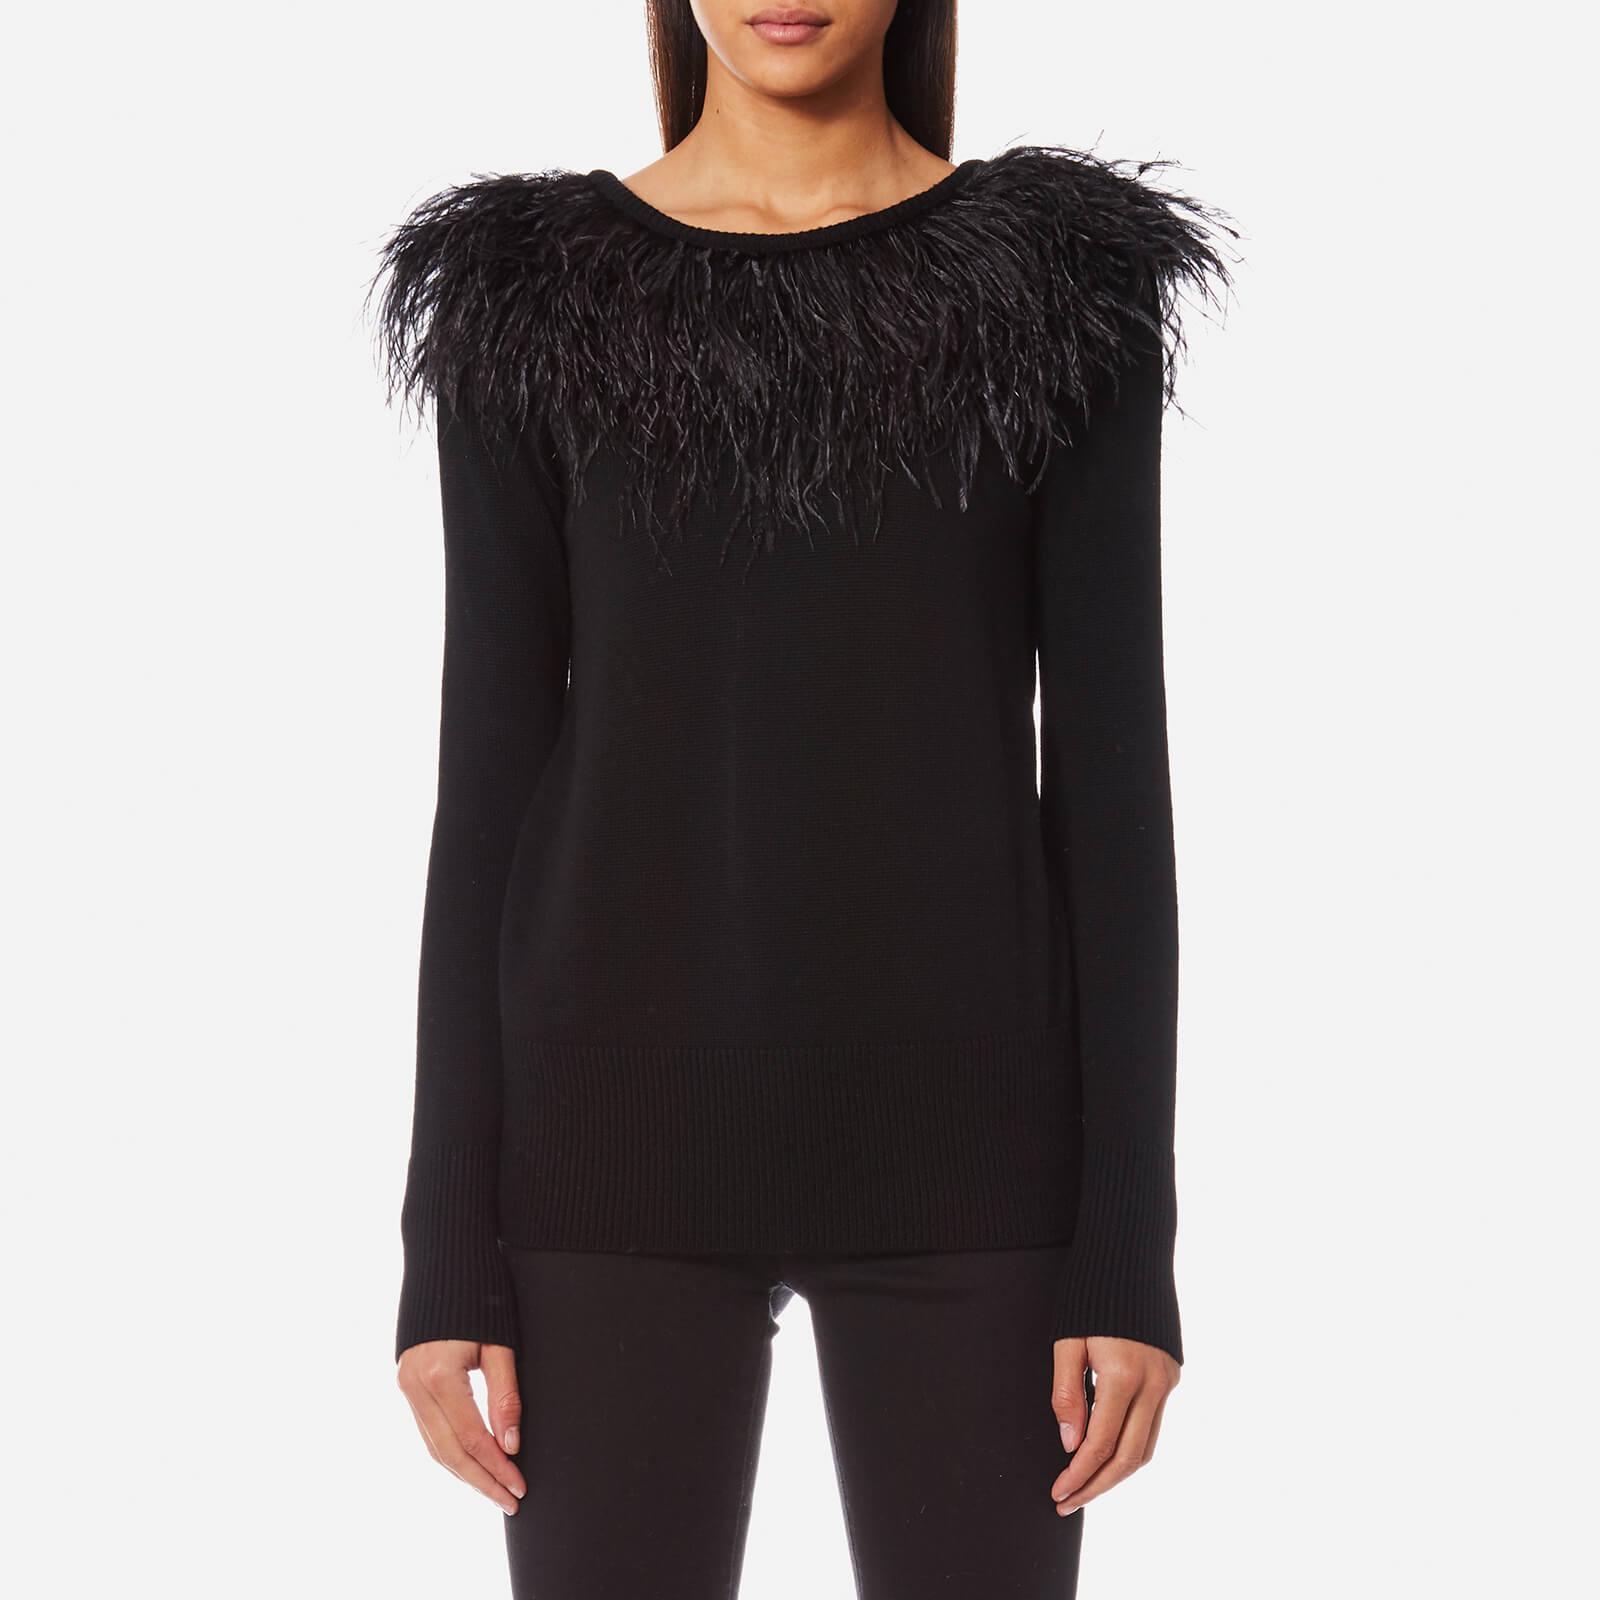 0c3ad042403 MICHAEL MICHAEL KORS Women s Feather Sweatshirt - Black - Free UK ...